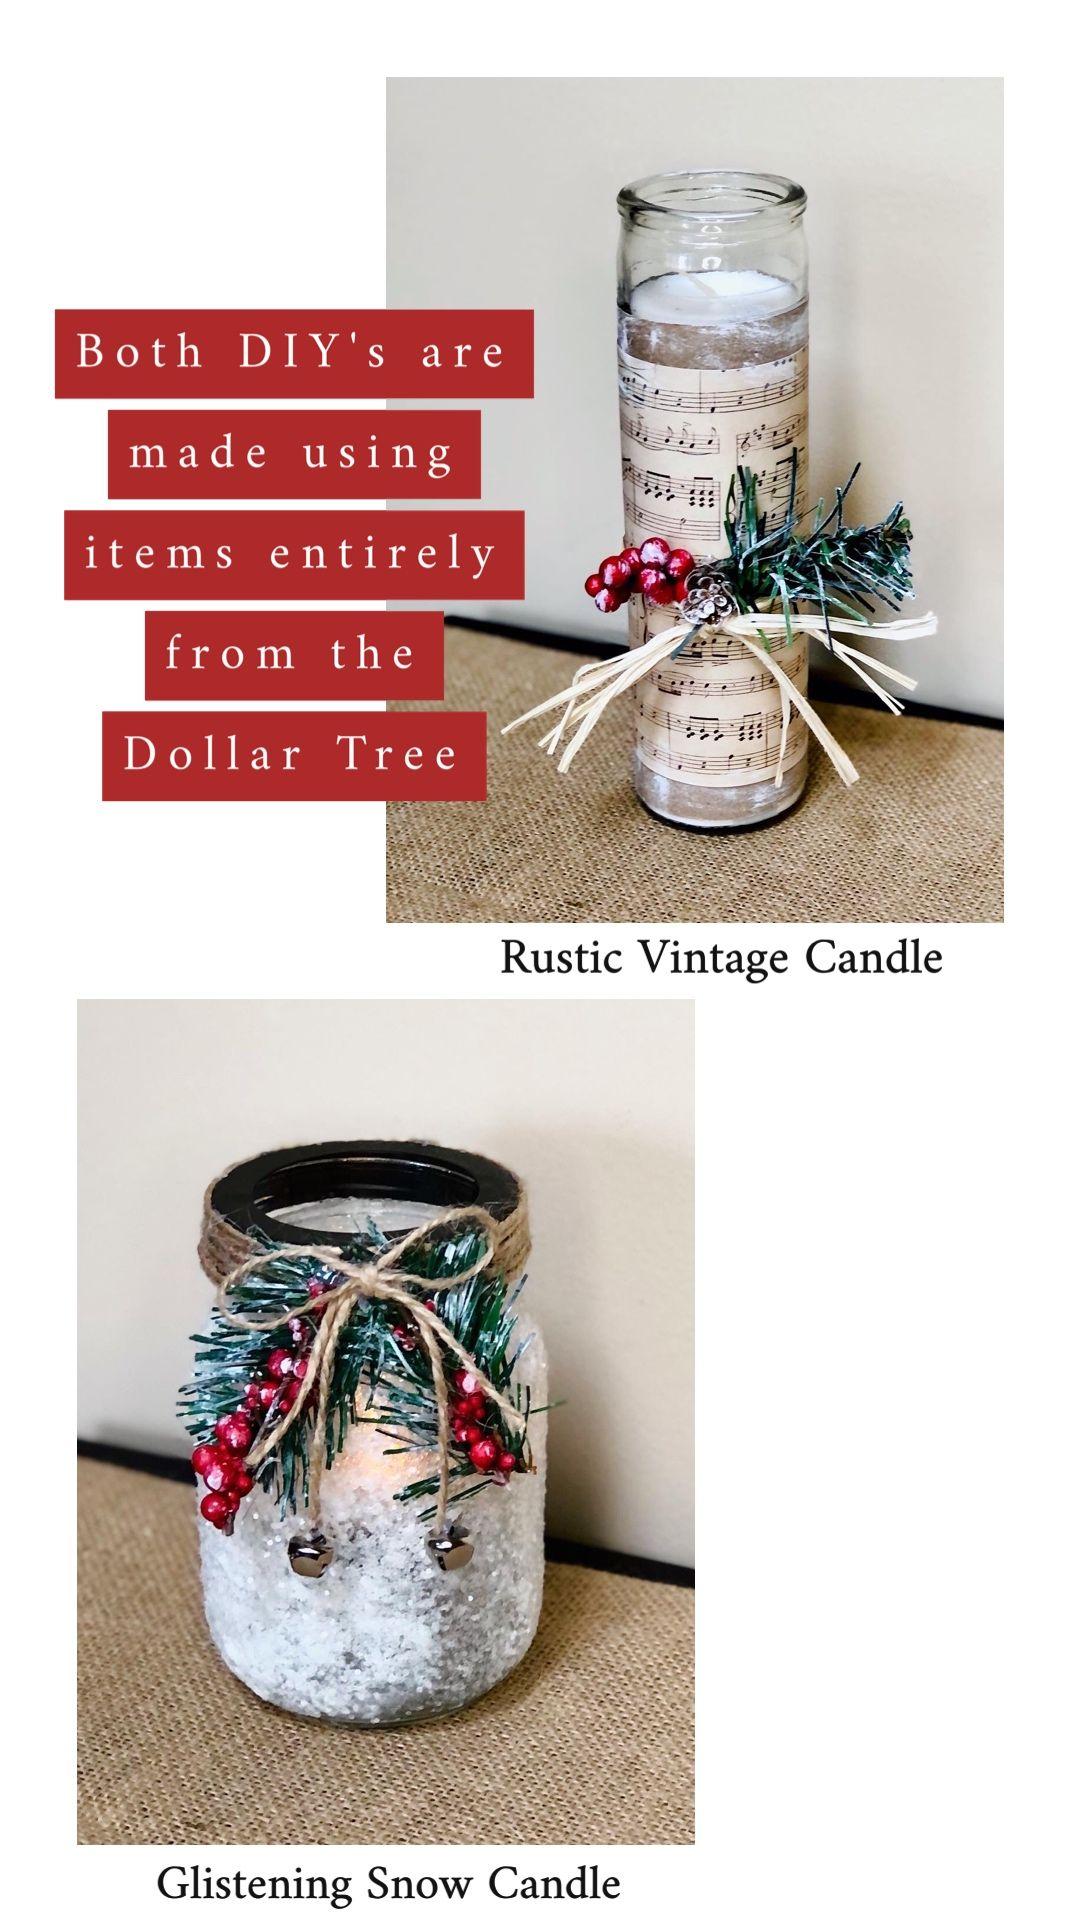 #rustic #rusticdecor #rusticChristmas #rusticfarmhouse #christmas #dollartree #dollartreediy